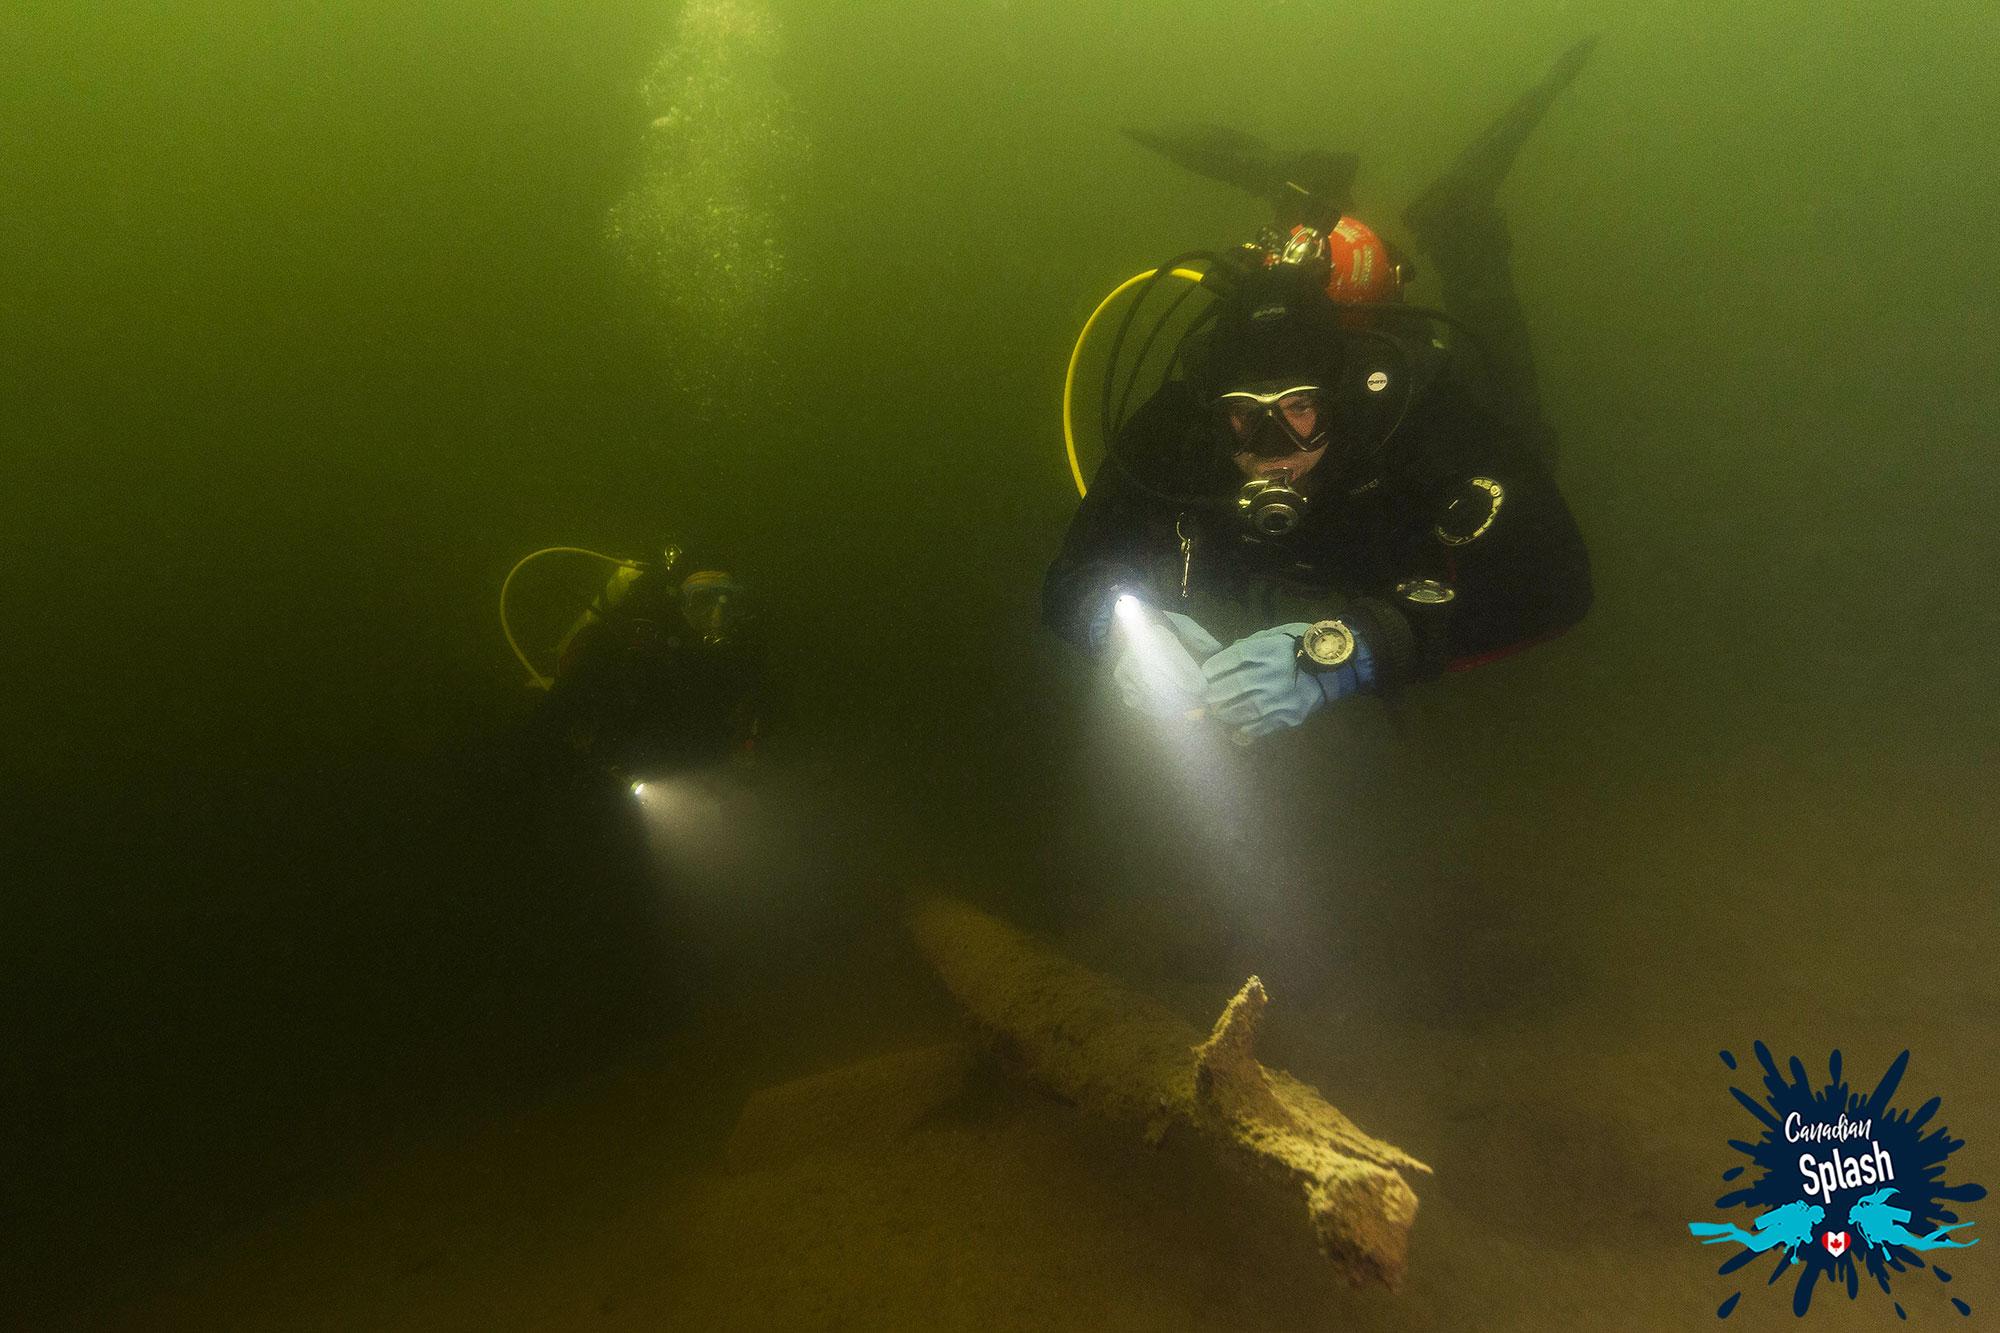 Dad And Joey Scuba Diving In Lake Temagami, Finlayson Provincial Park, Ontario, Canada